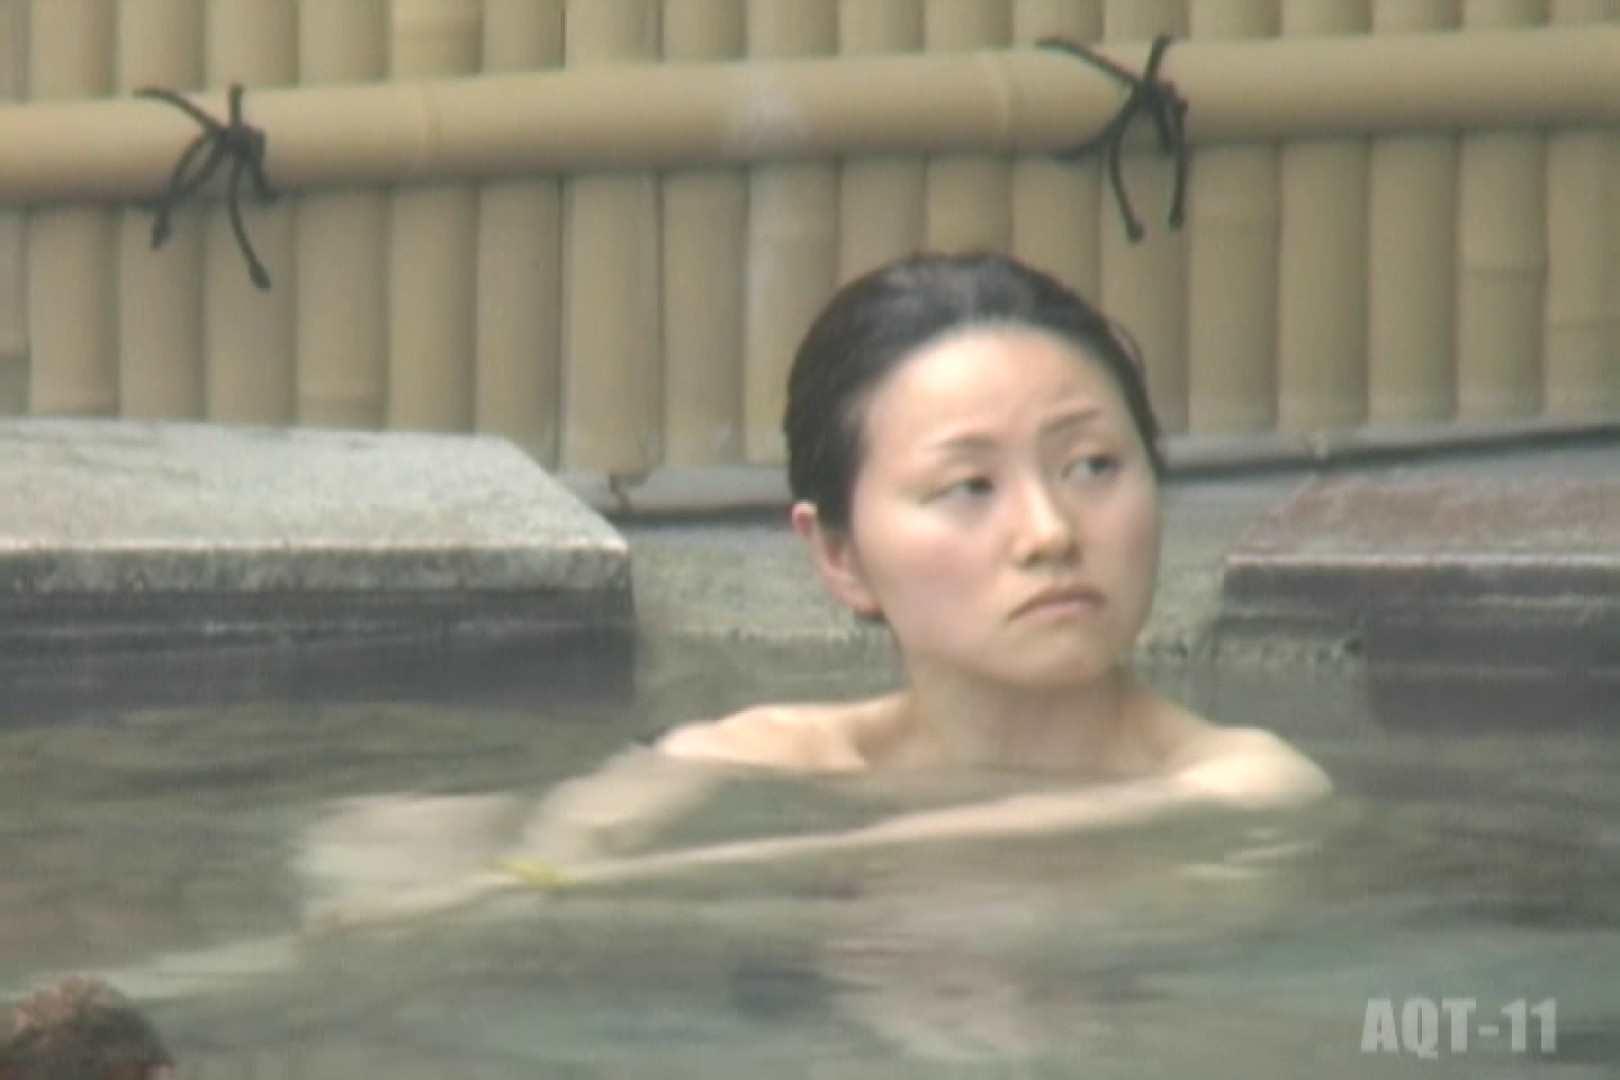 Aquaな露天風呂Vol.802 女体盗撮 盗み撮りSEX無修正画像 85連発 11